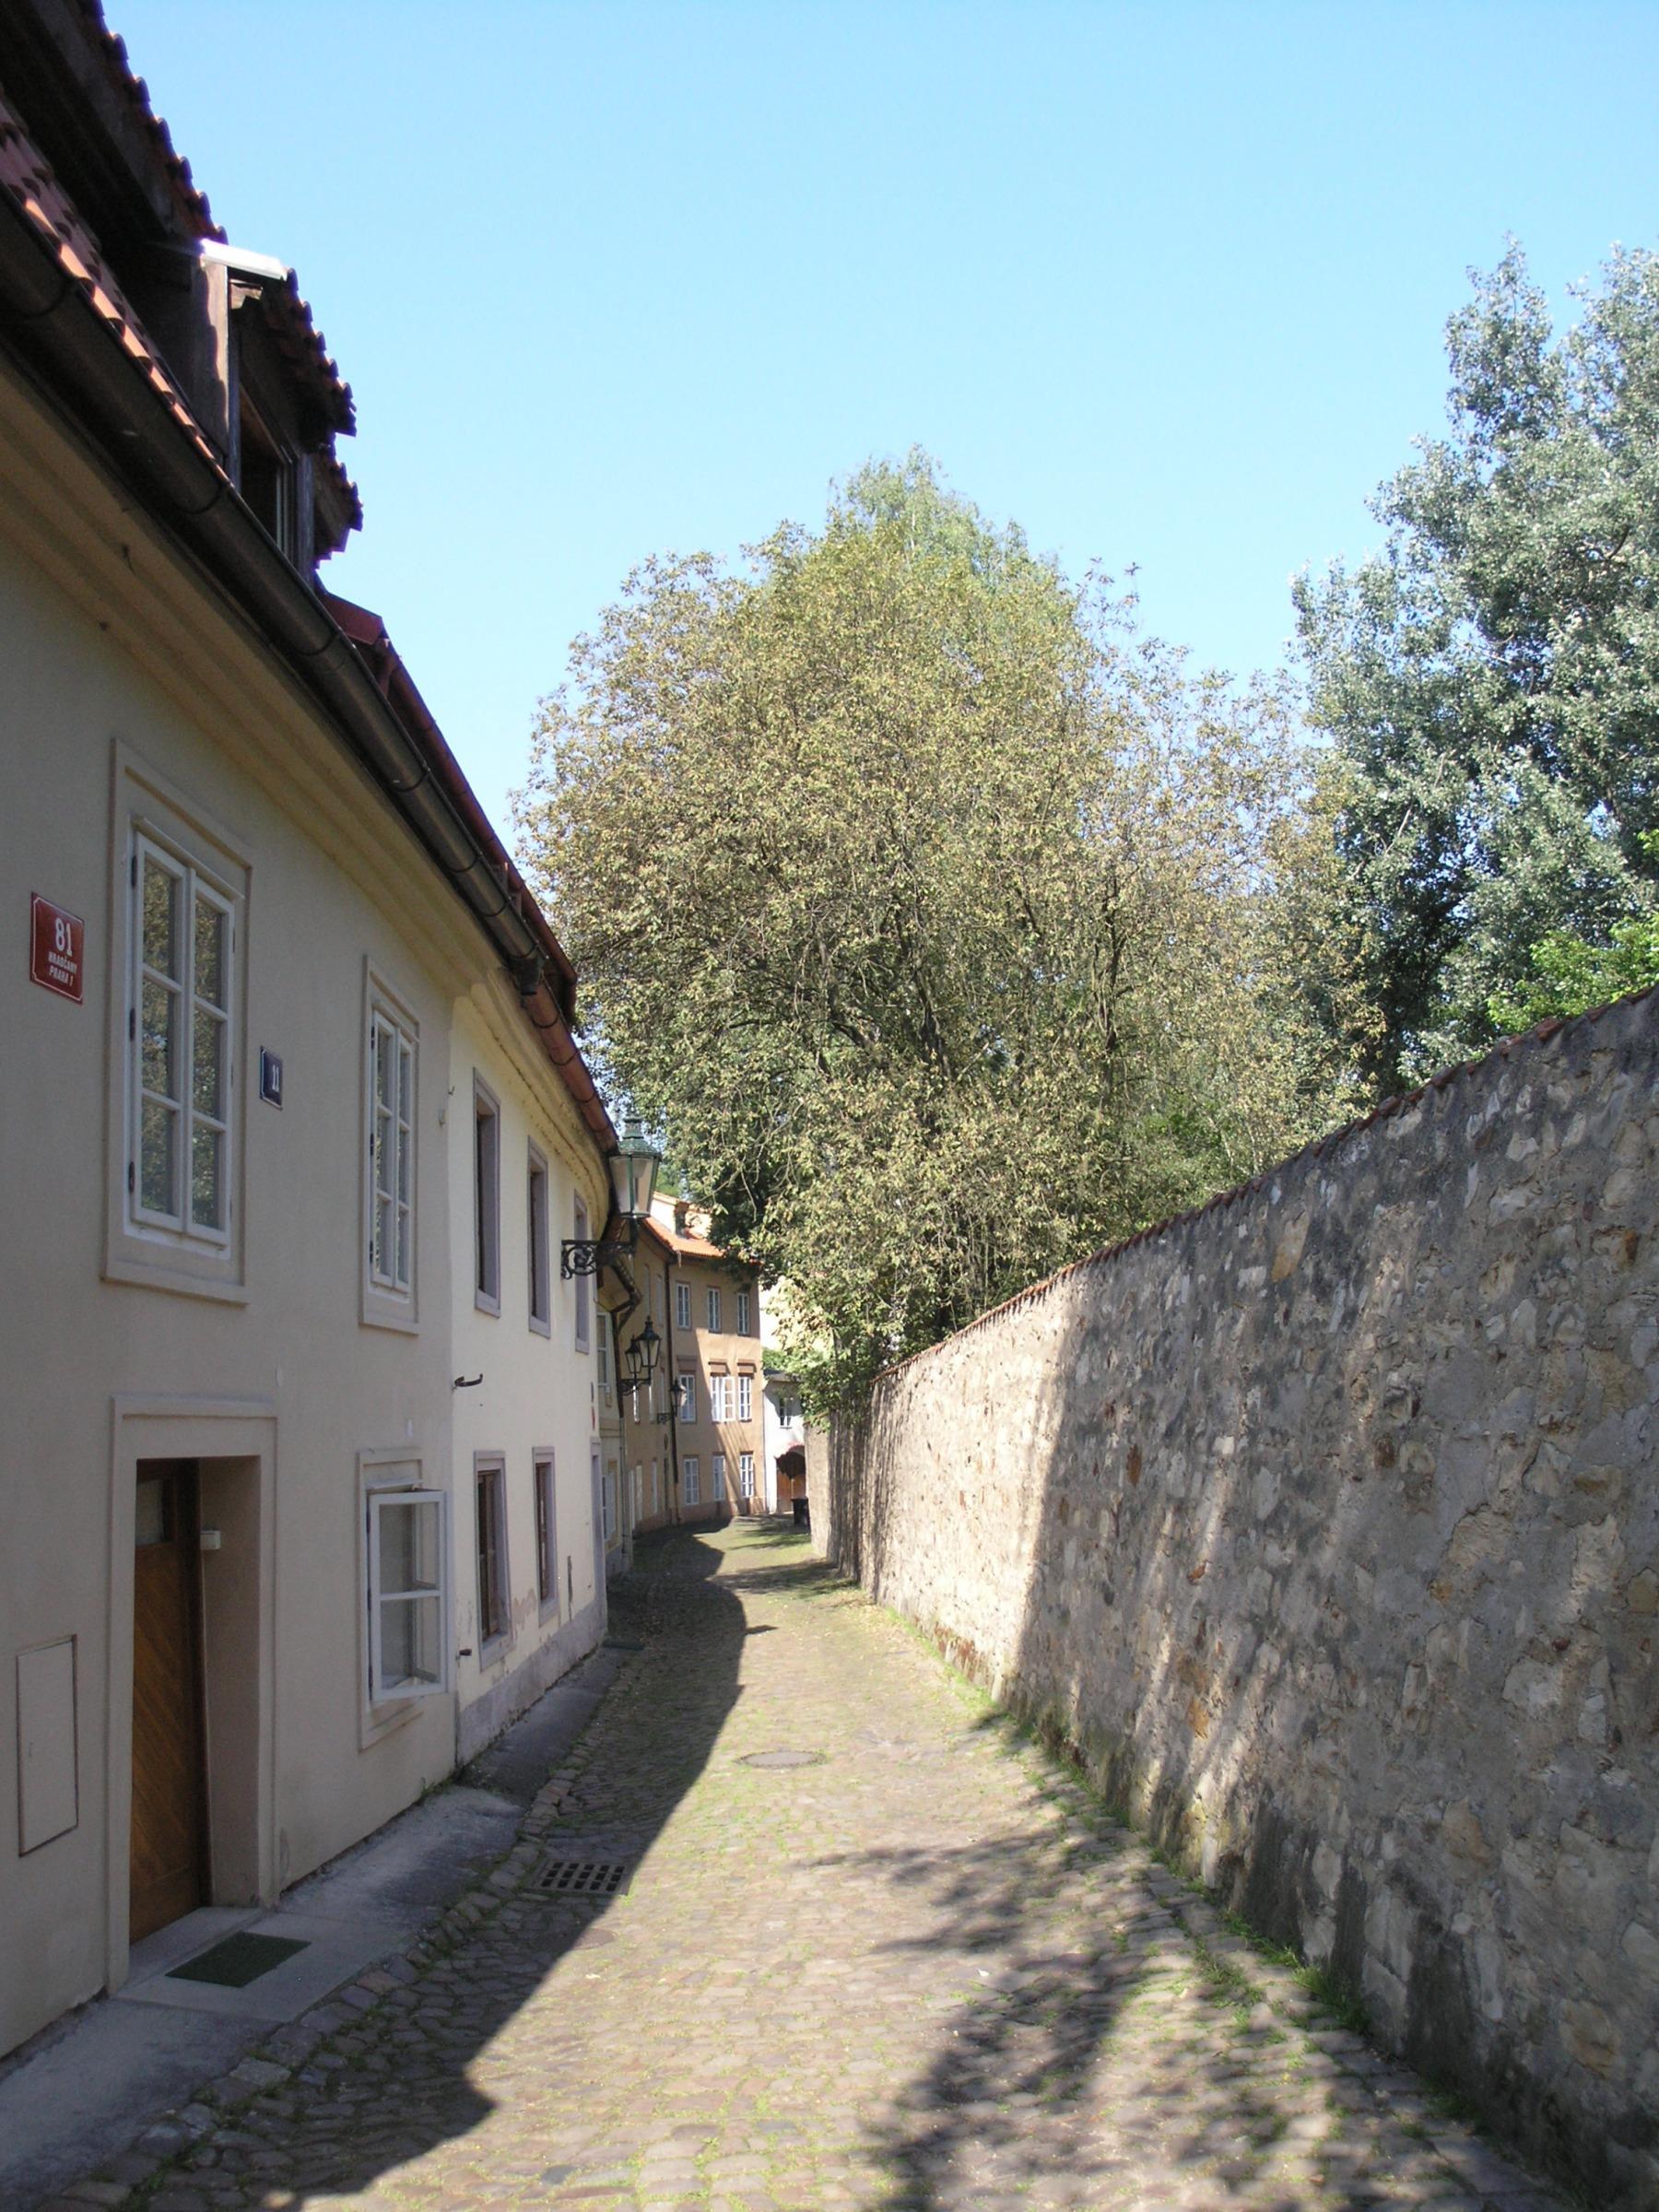 novy svet  File:Praha, Hradcany - Novy svet (od cp 11 k hradbam).jpg - Wikipedia